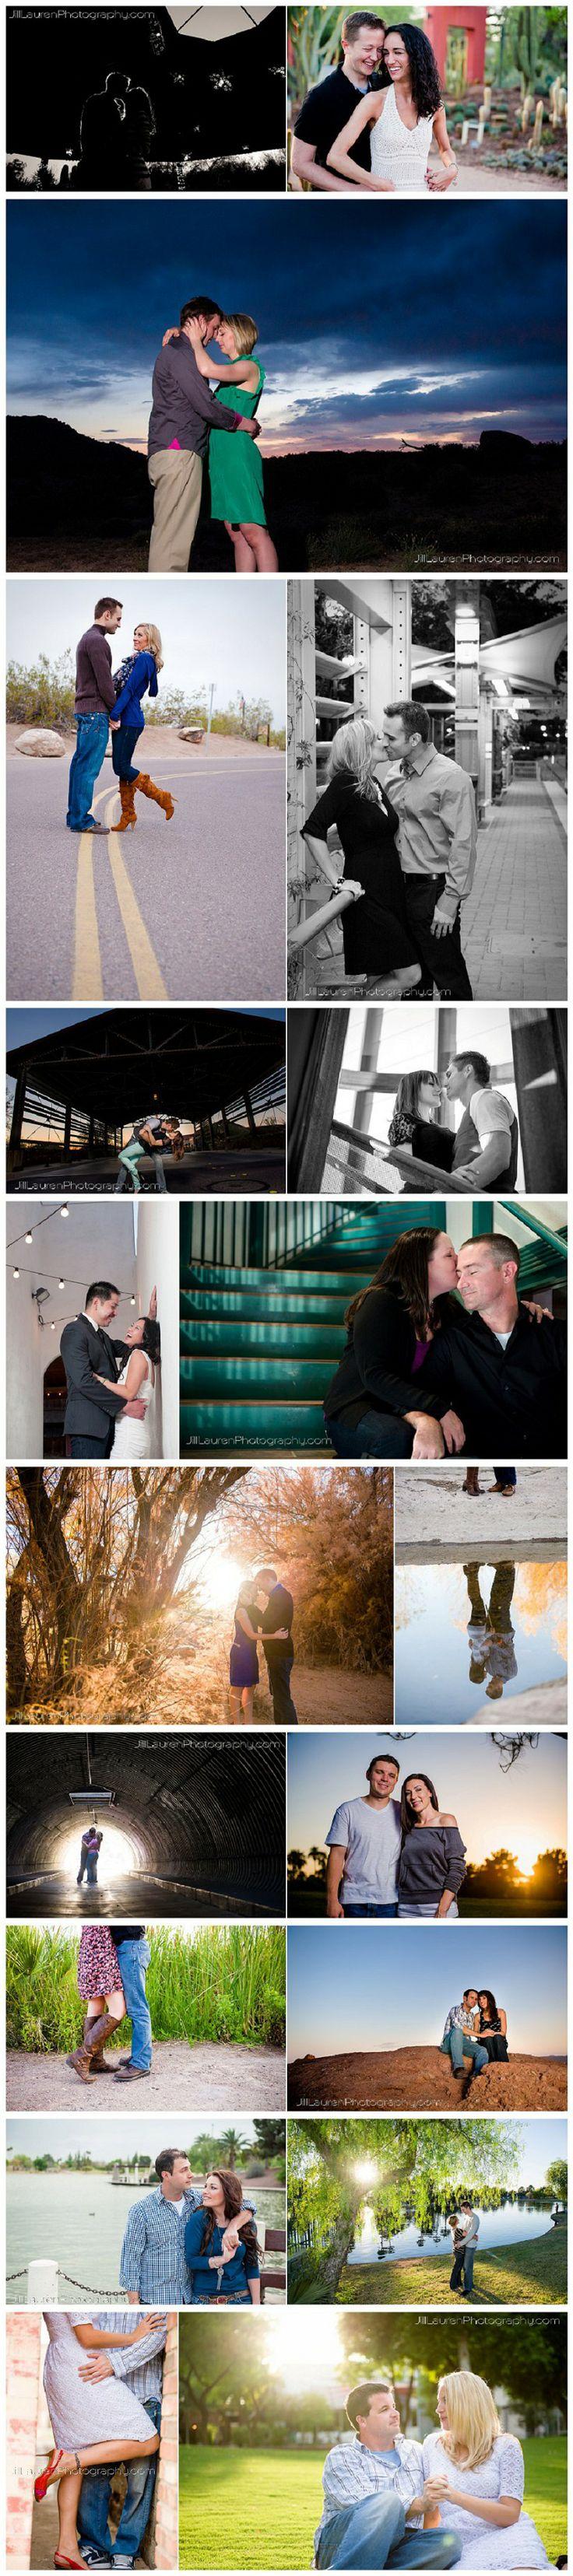 Top 10 Best Engagement Photo Locations in Phoenix Arizona